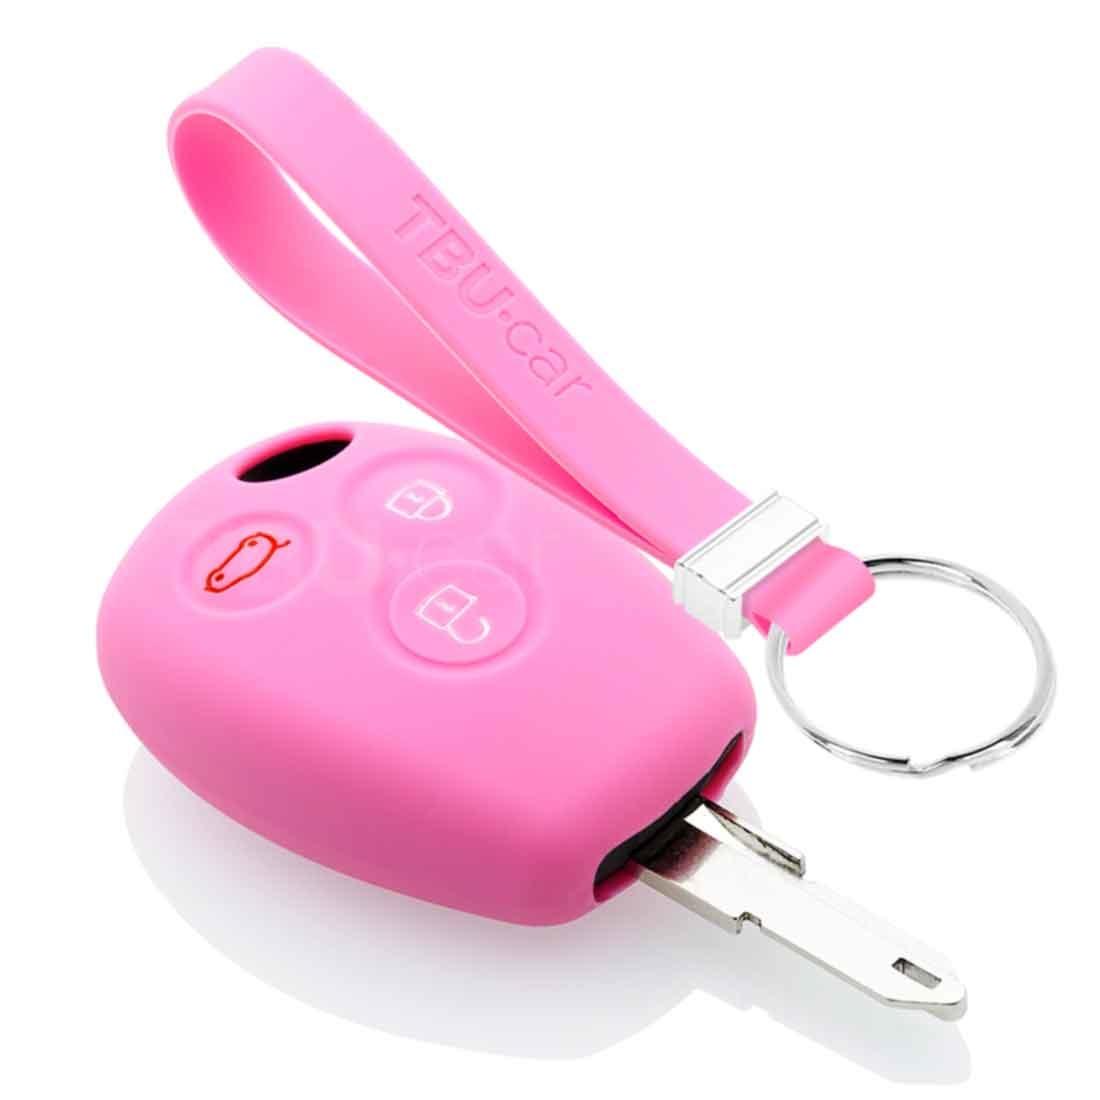 TBU car TBU car Car key cover compatible with Dacia - Silicone Protective Remote Key Shell - FOB Case Cover - Pink